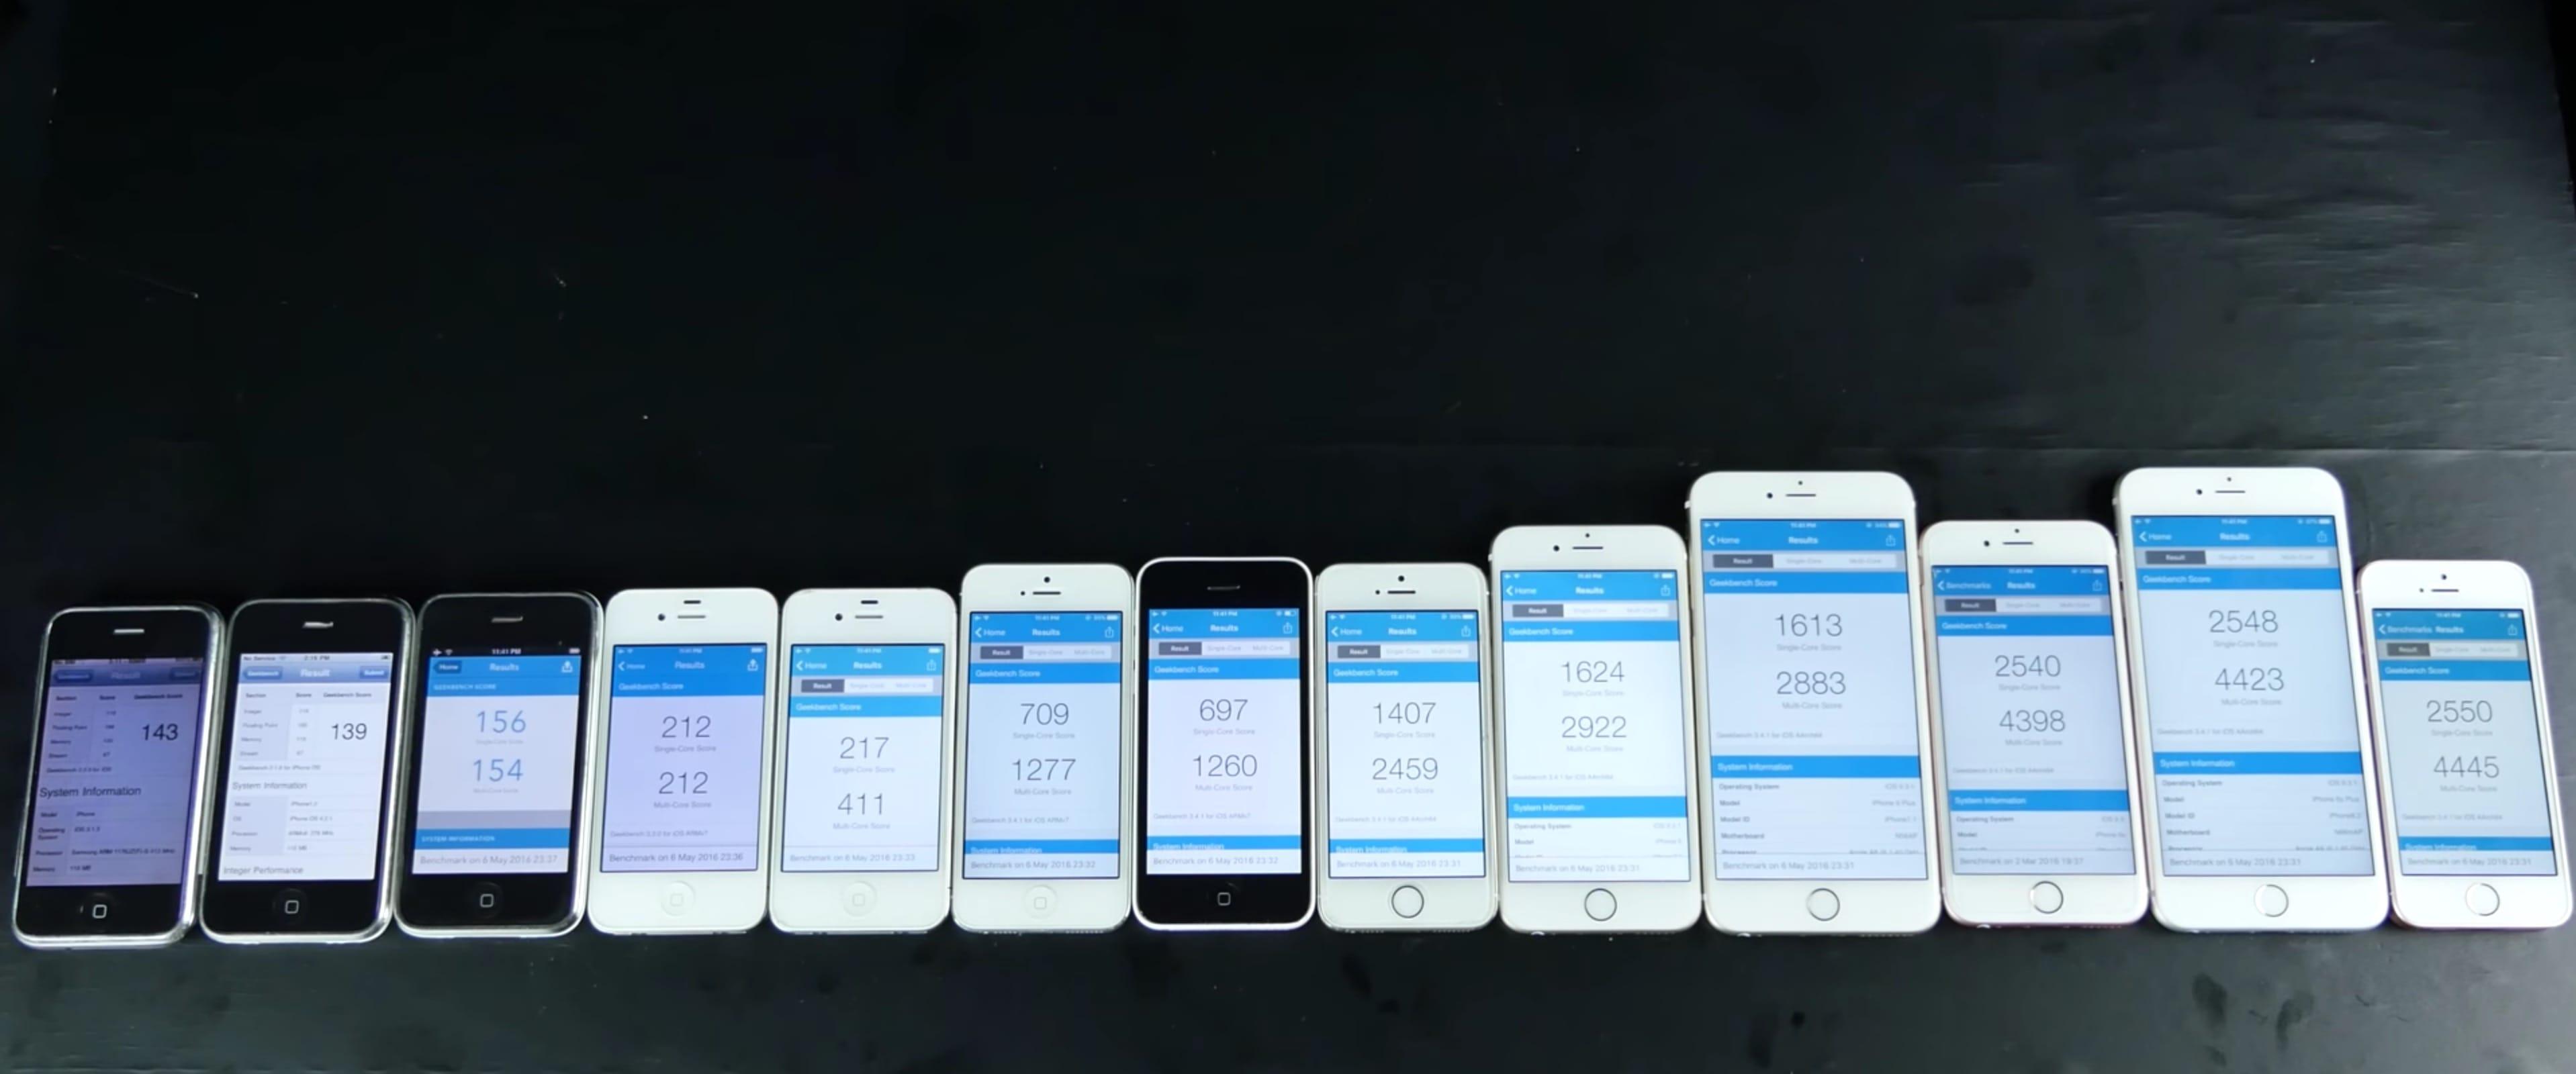 Comparatif Iphone  Et Iphone Se